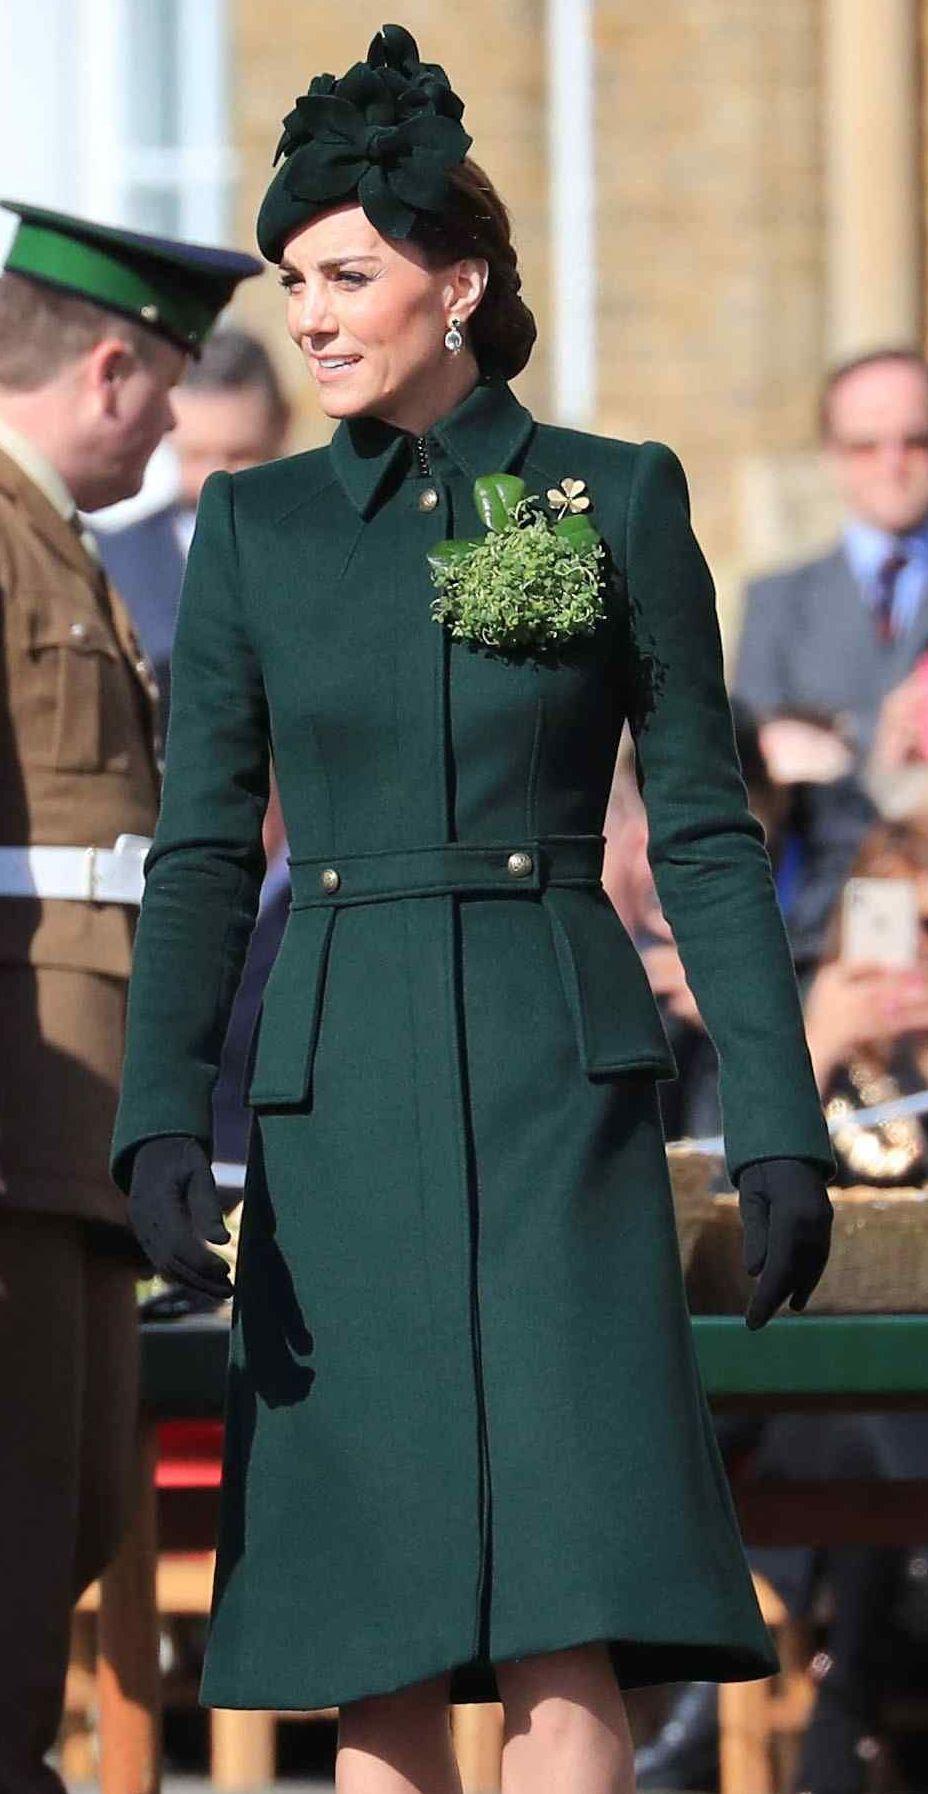 Alexander mcqueen green military coat royal clothing